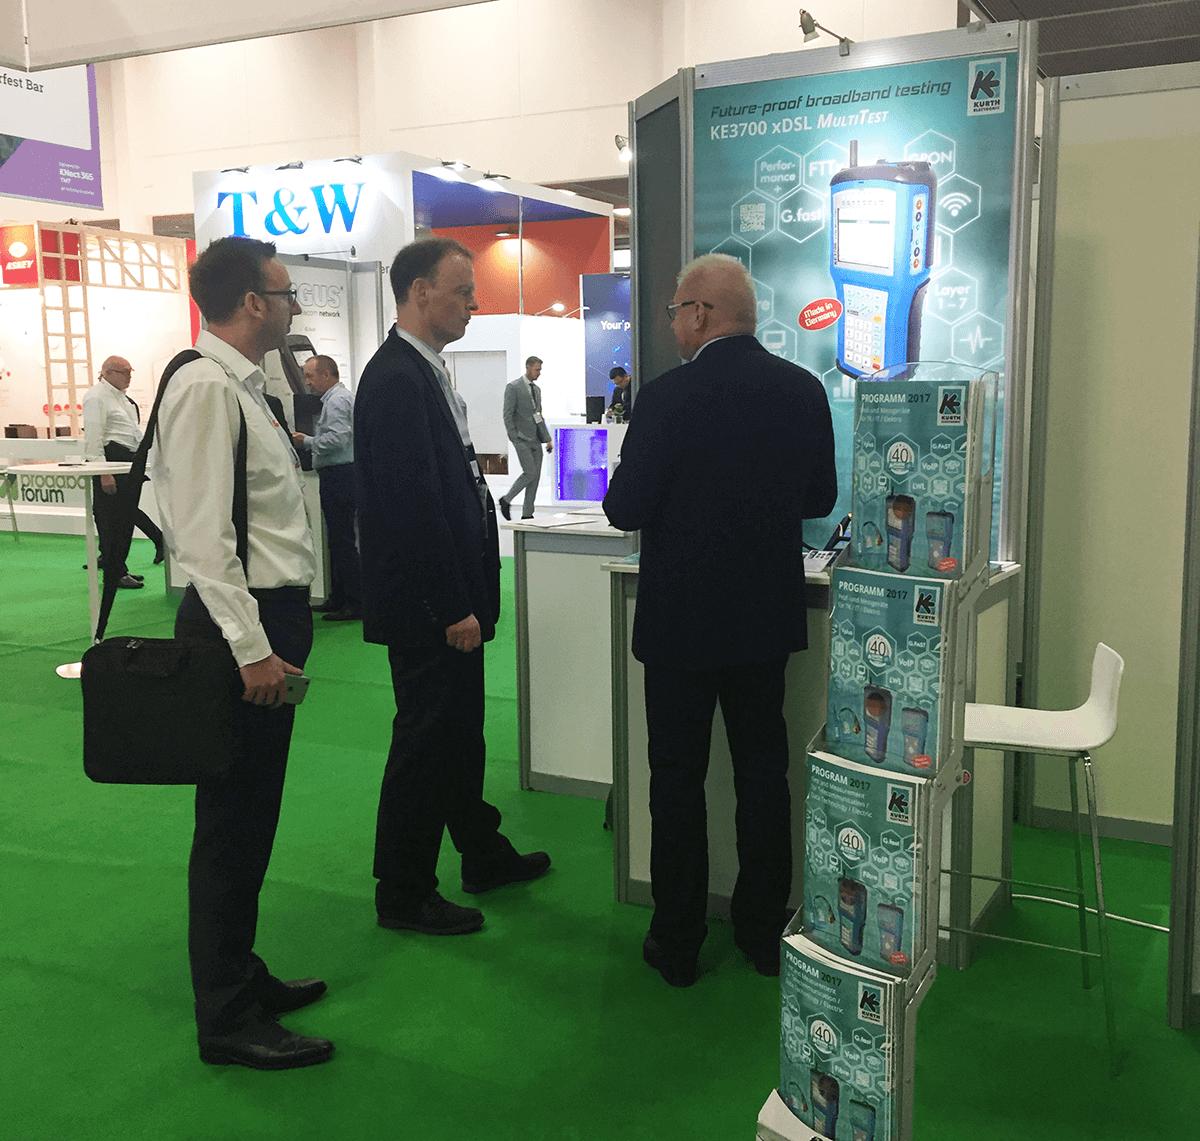 Broadband World Forum 2017 mit KE-Präsenz